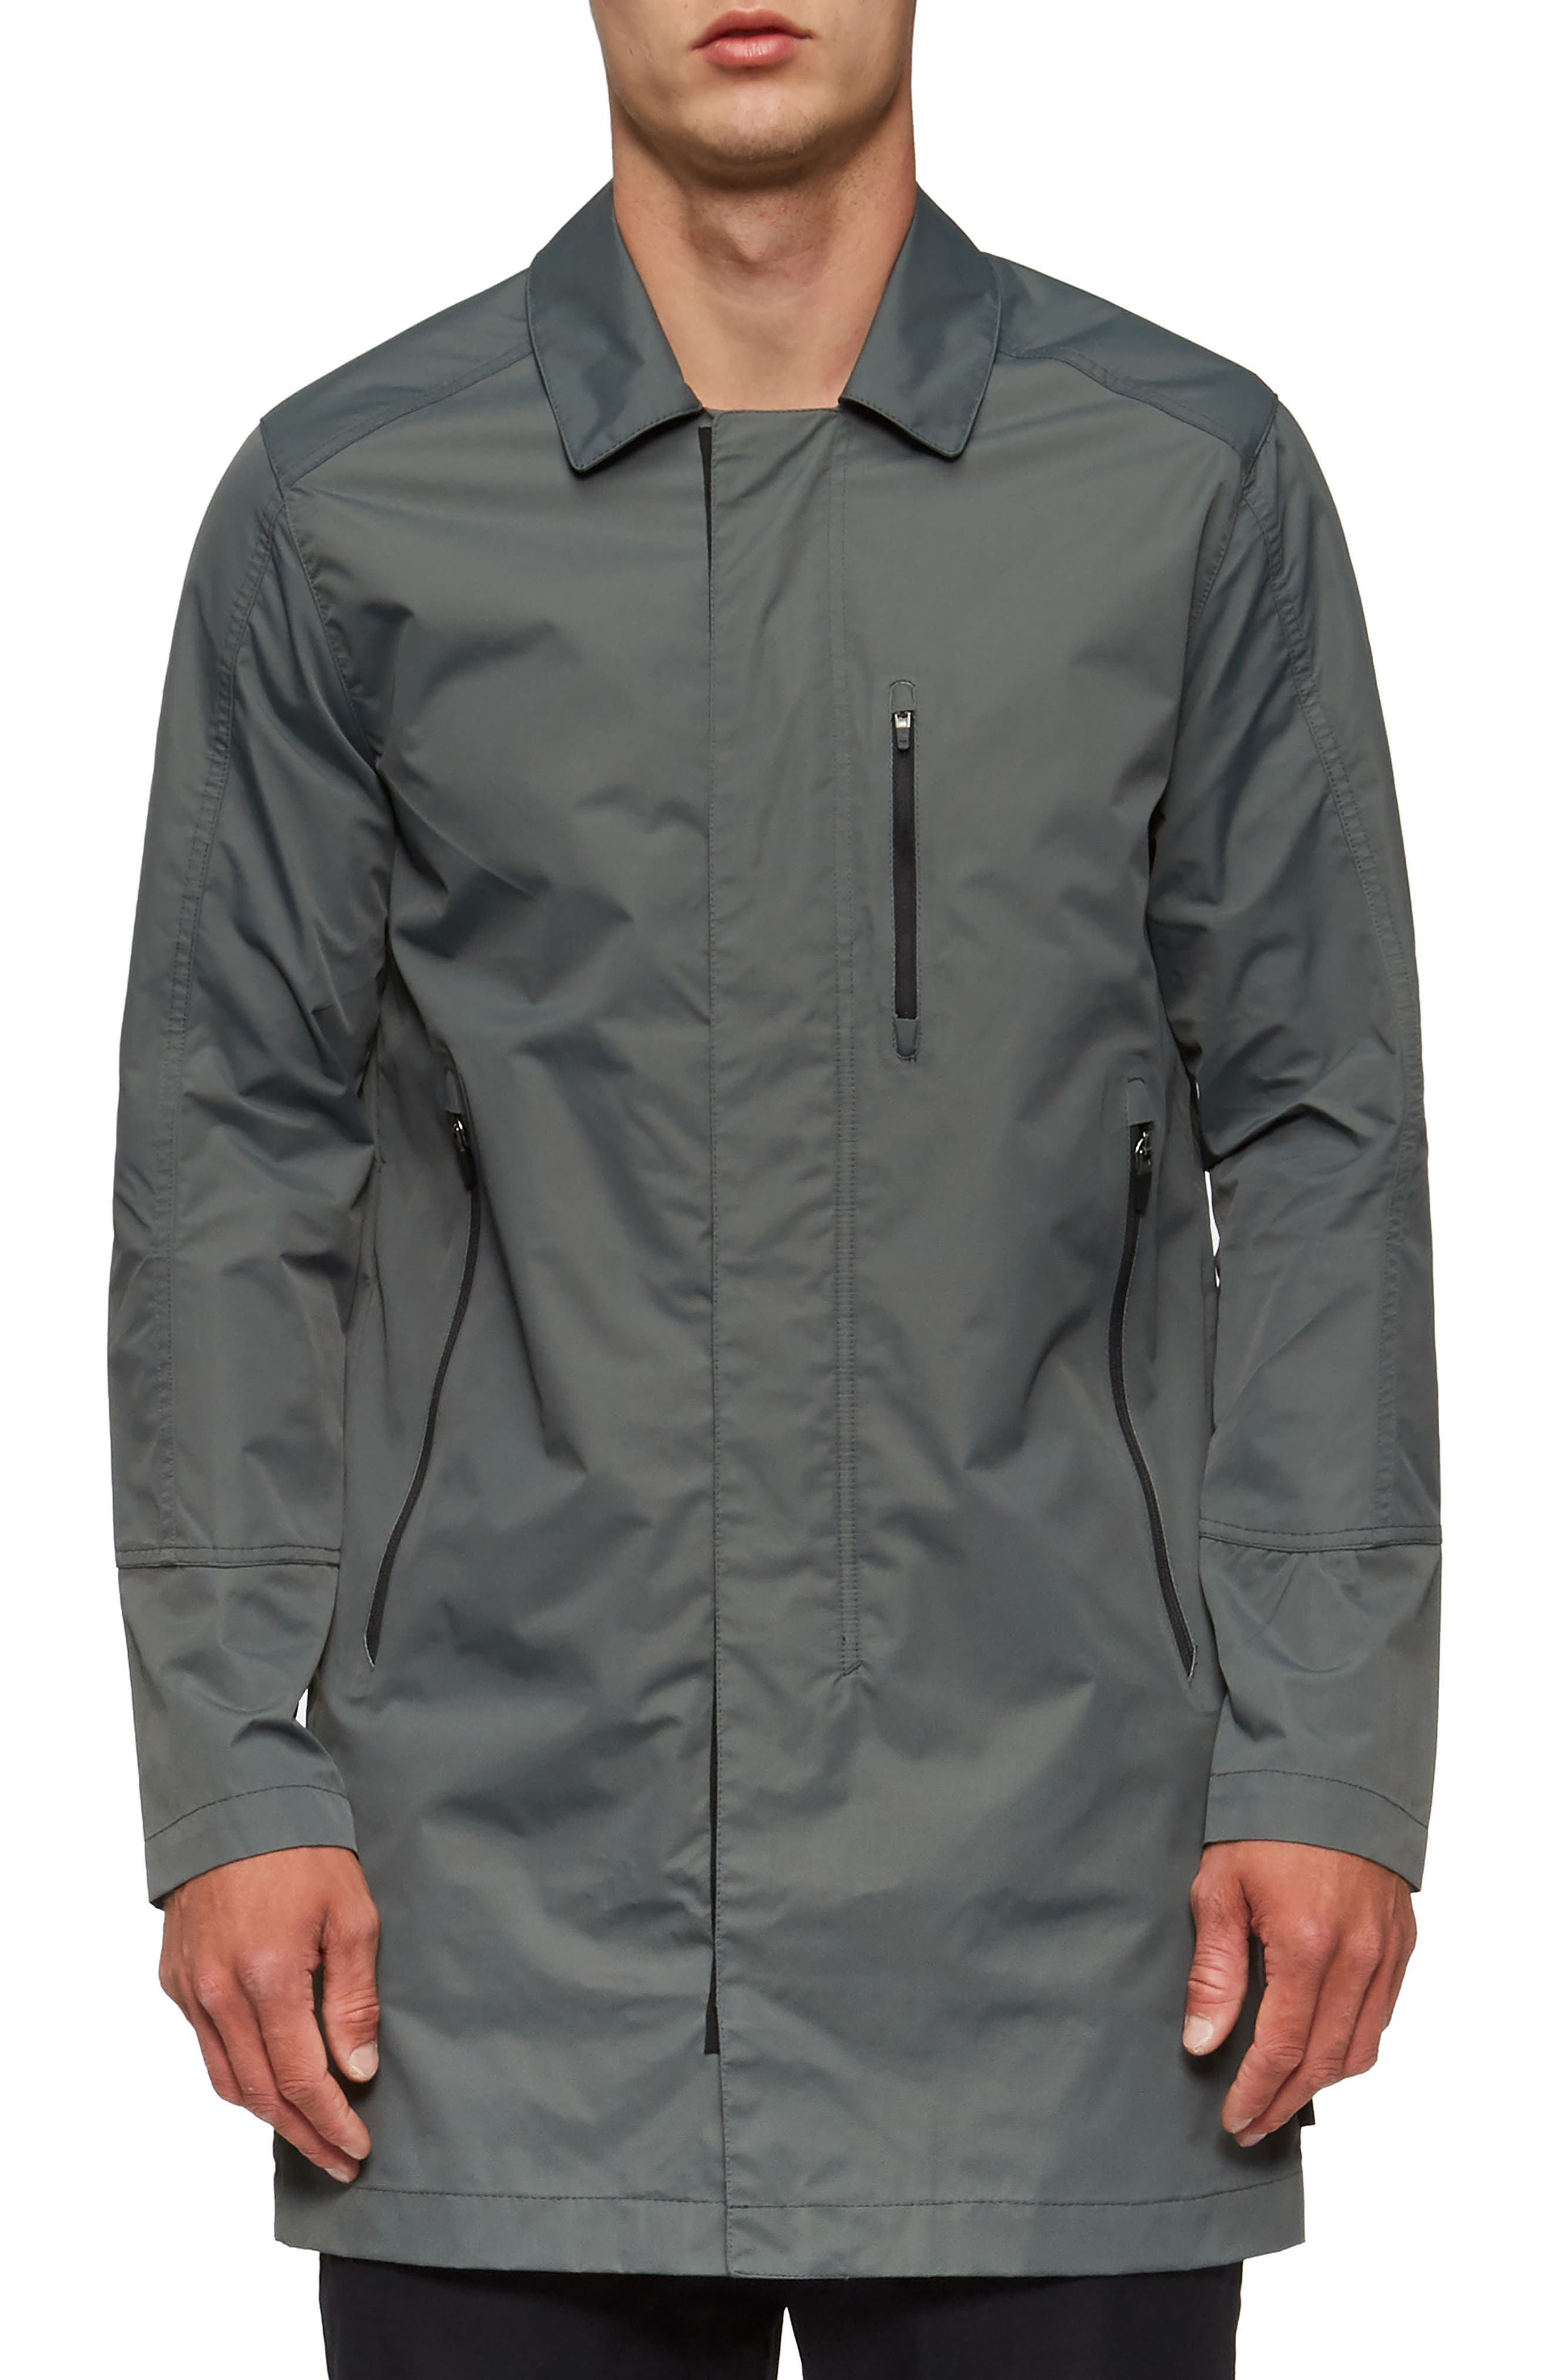 Deckard Weather Resistant Trench Coat,                         Main,                         color, Surplus Green